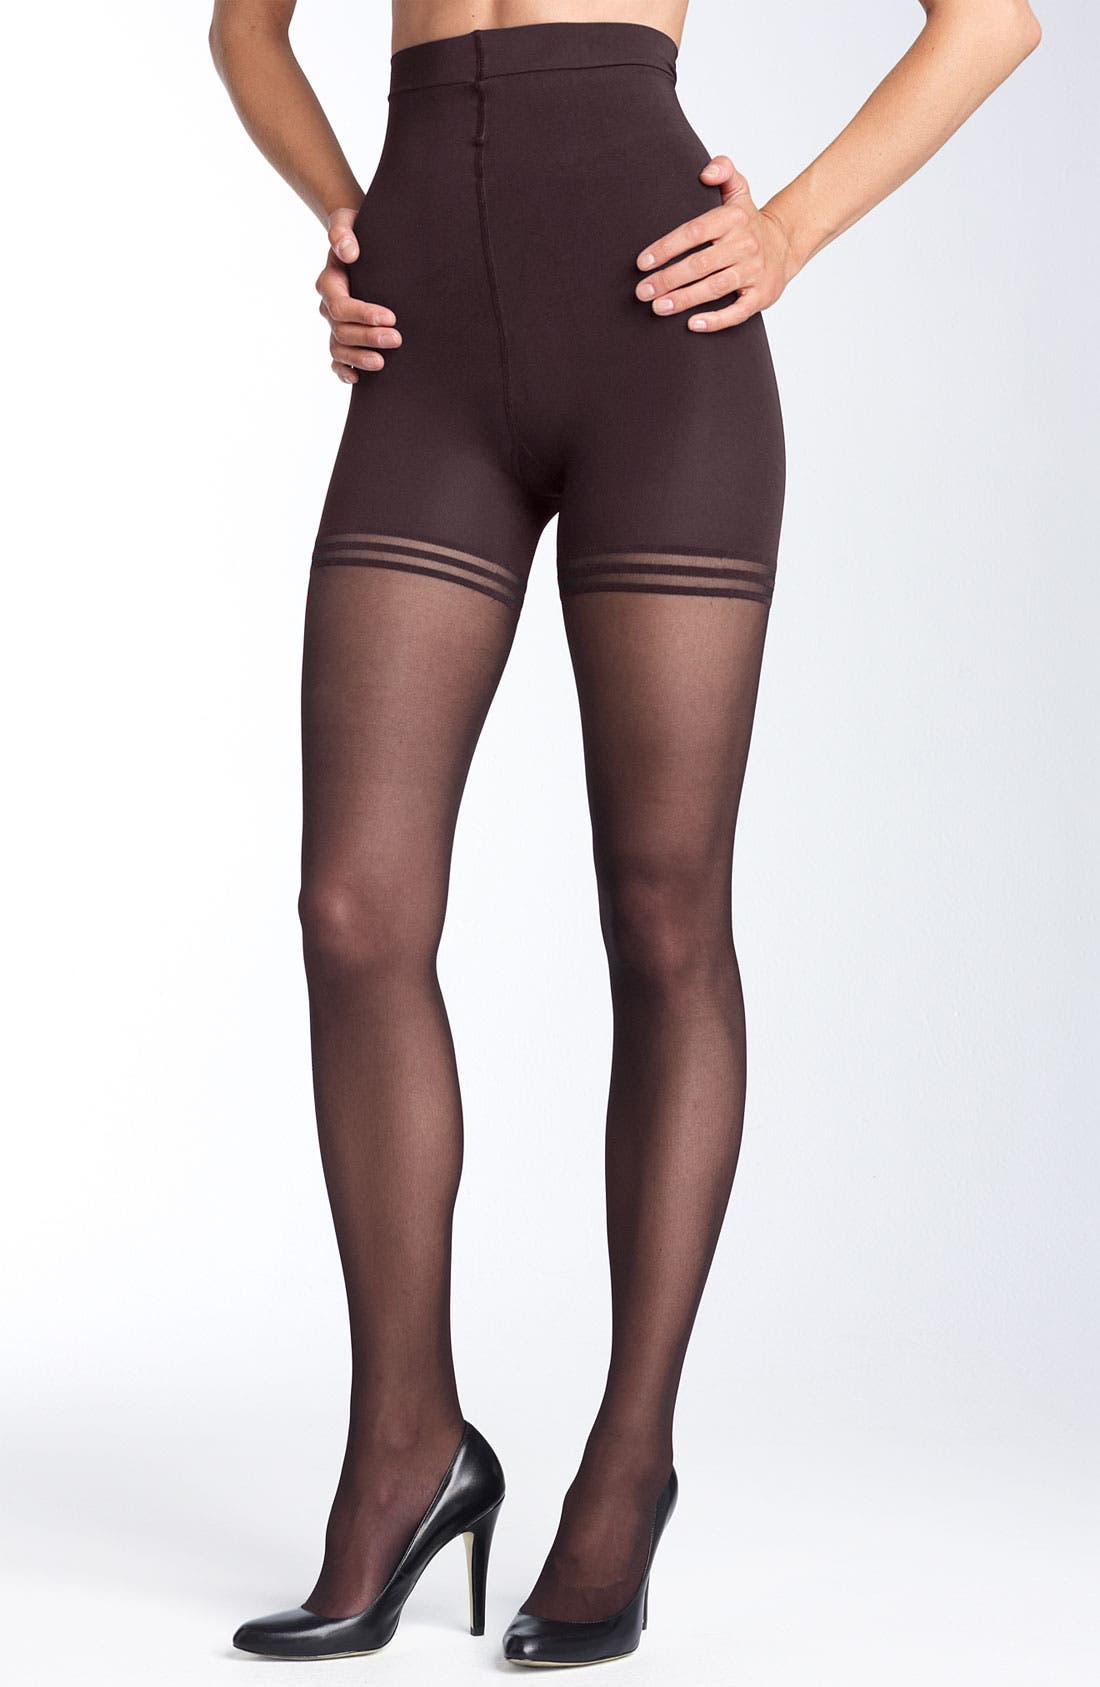 Alternate Image 1 Selected - Donna Karan 'Sheer Satin Ultimate Toner' Pantyhose